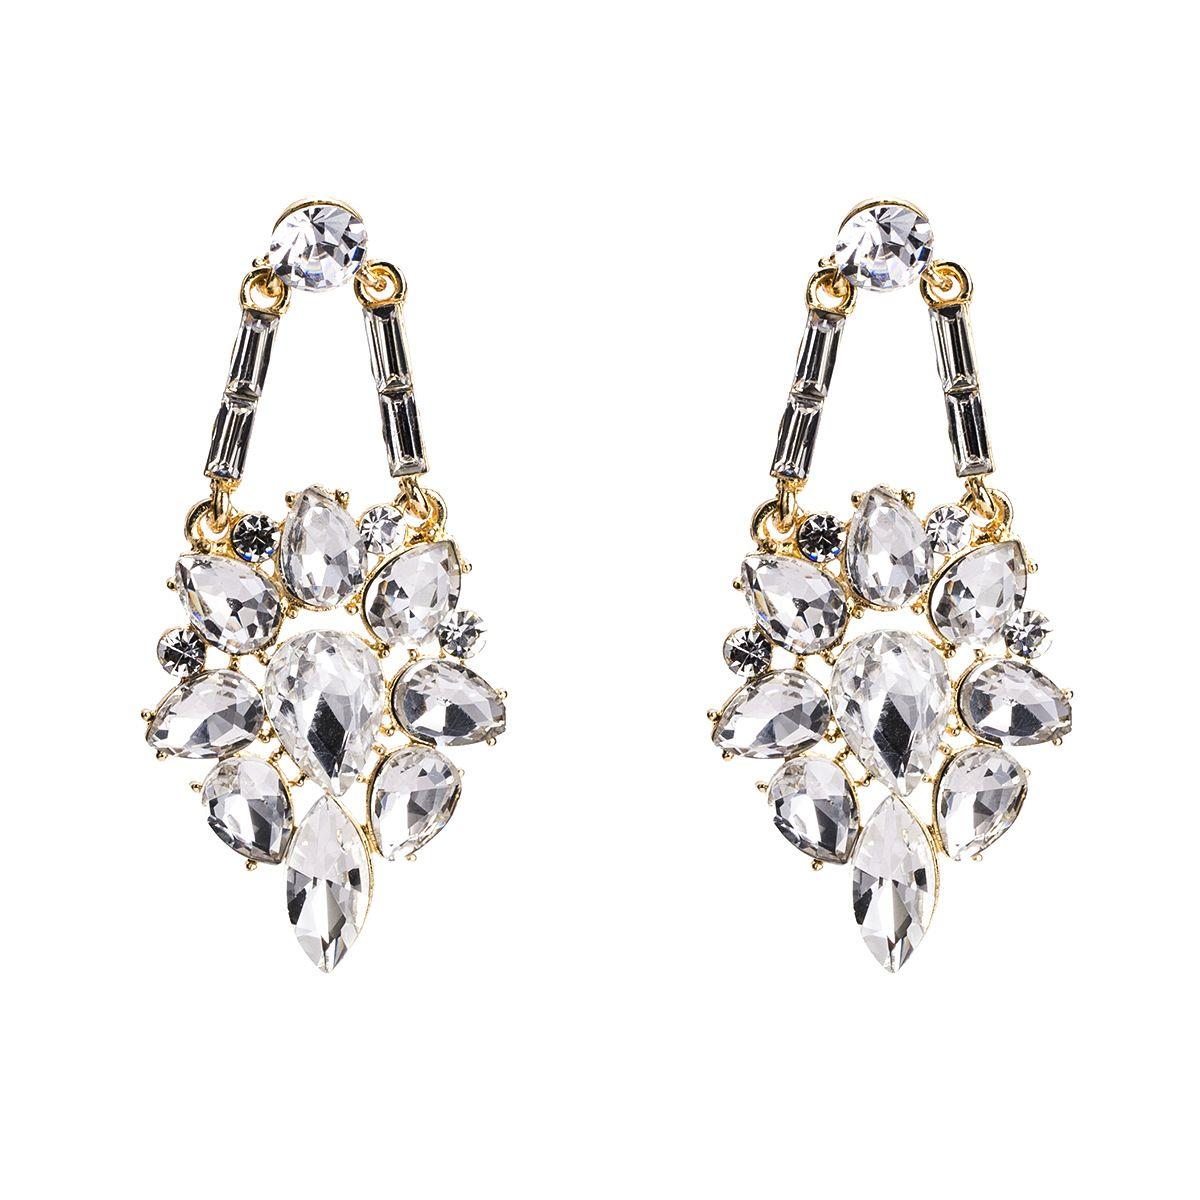 Brincos de borla para as mulheres de luxo boho personalidade Broca de vidro Dangle brincos simples Vintage geométrica moda Jóias atacado 2018